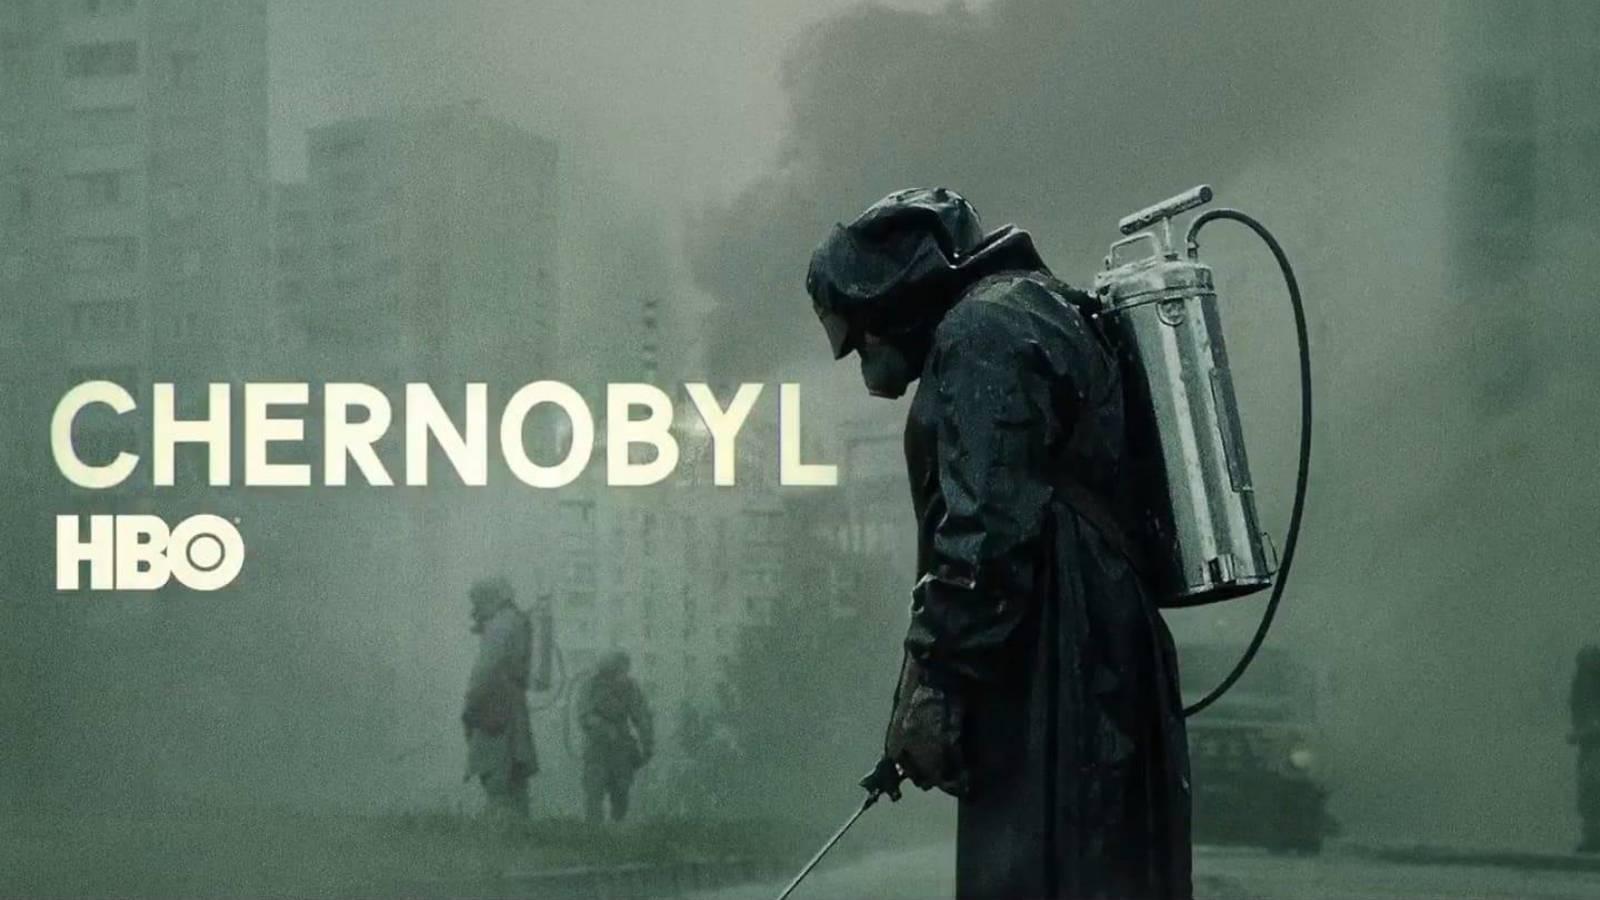 Chernobyl Image